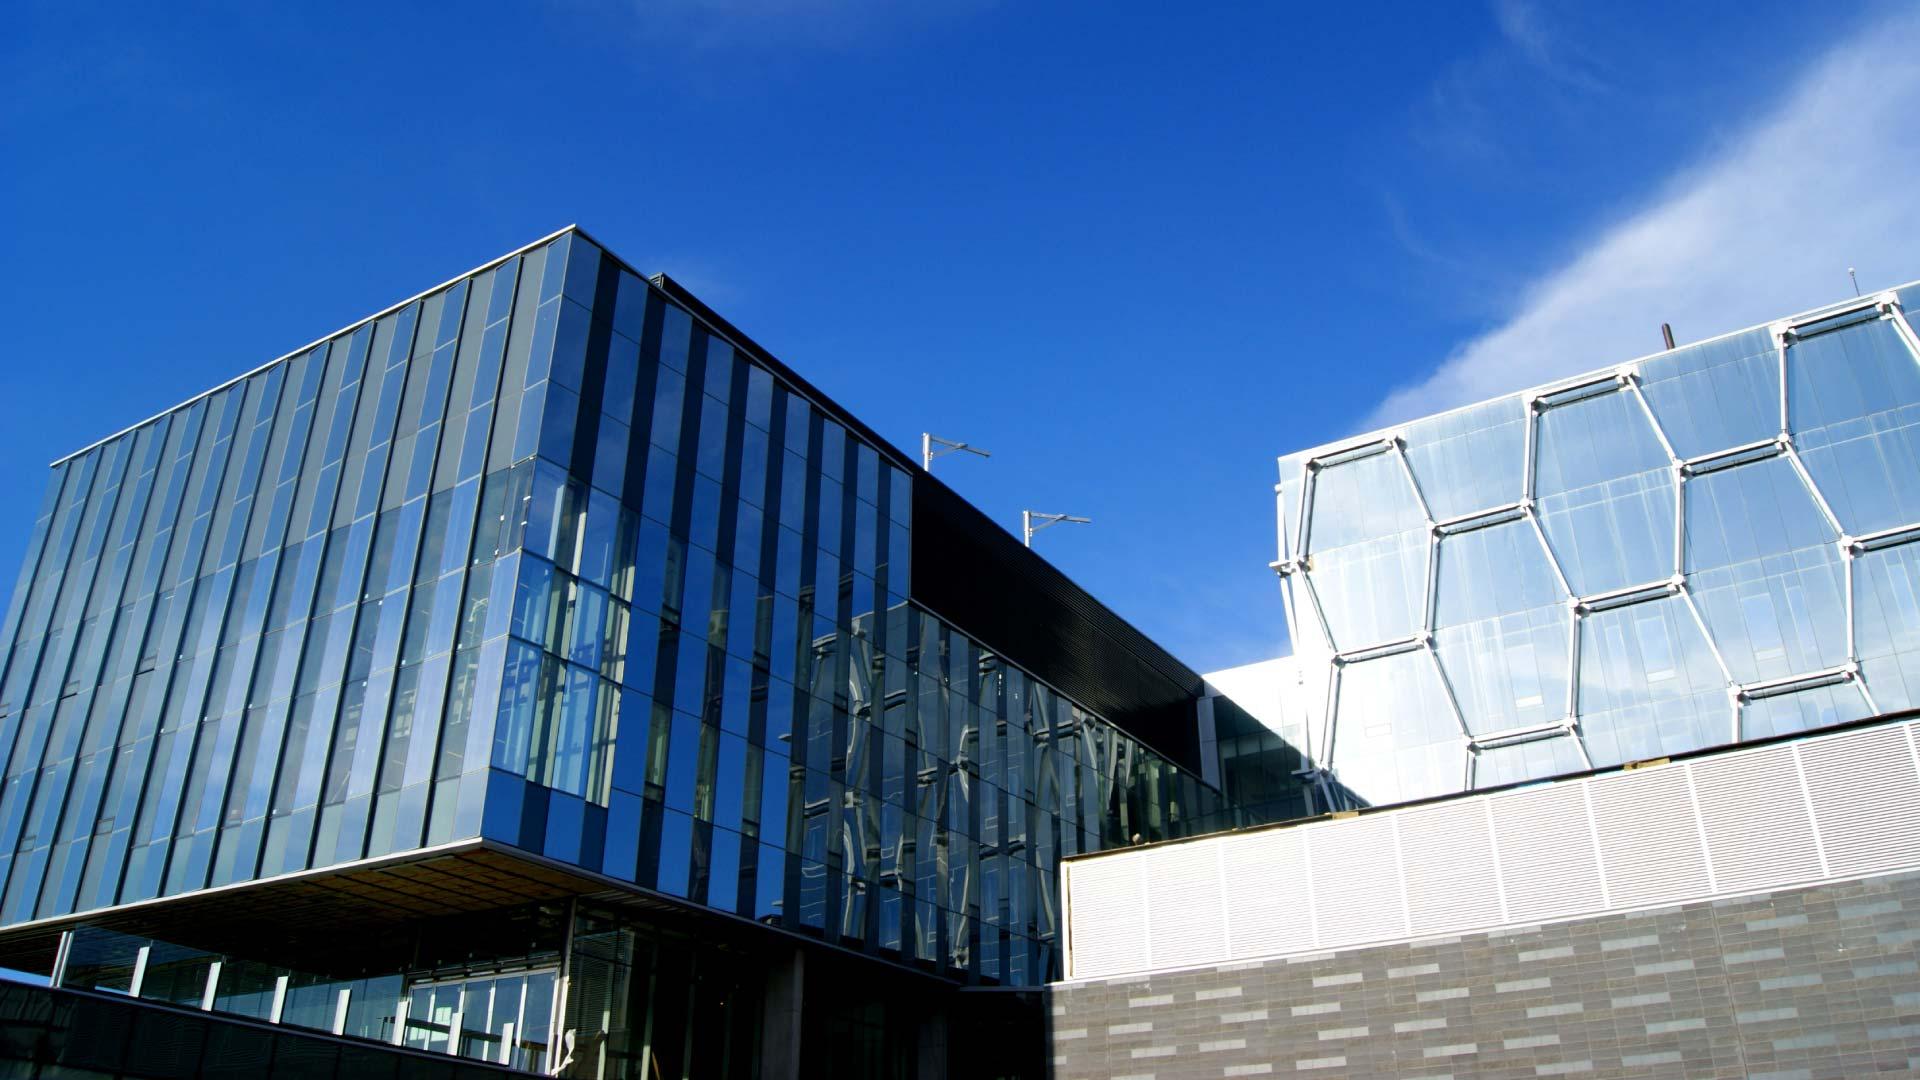 Nano Building under blue skies at the University of Waterloo